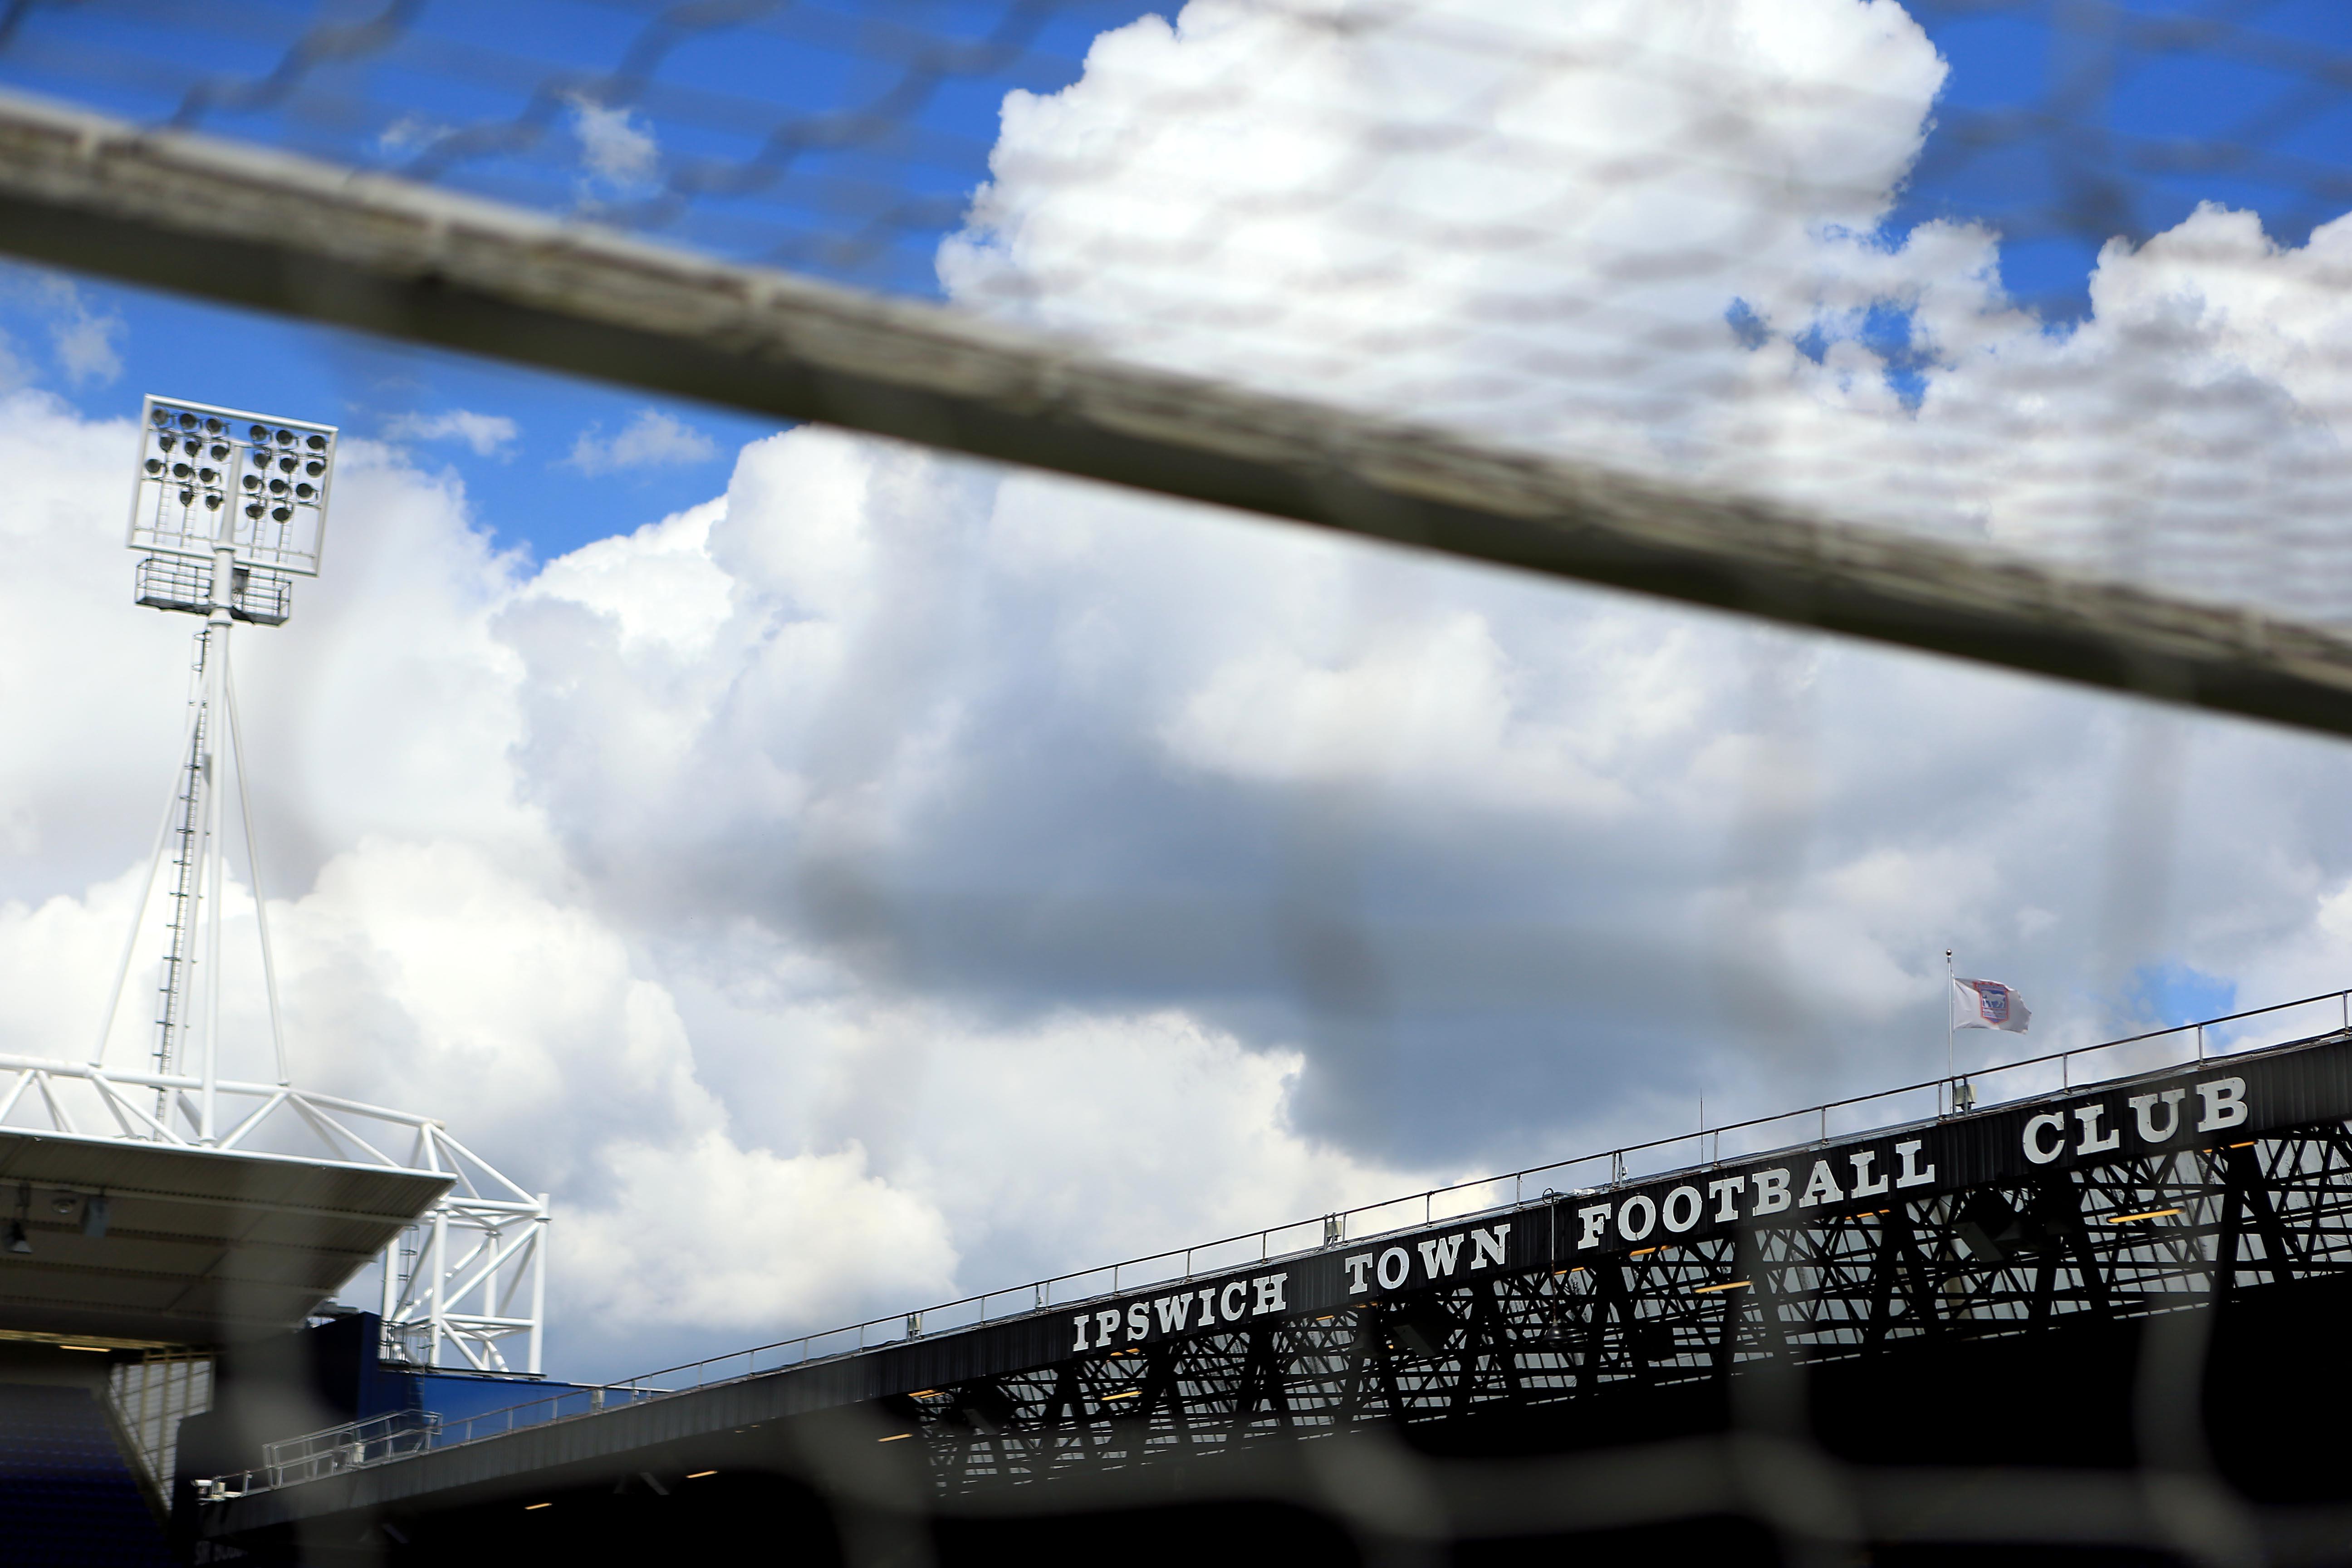 Ipswich Town v Milton Keynes Dons - Sky Bet Championship